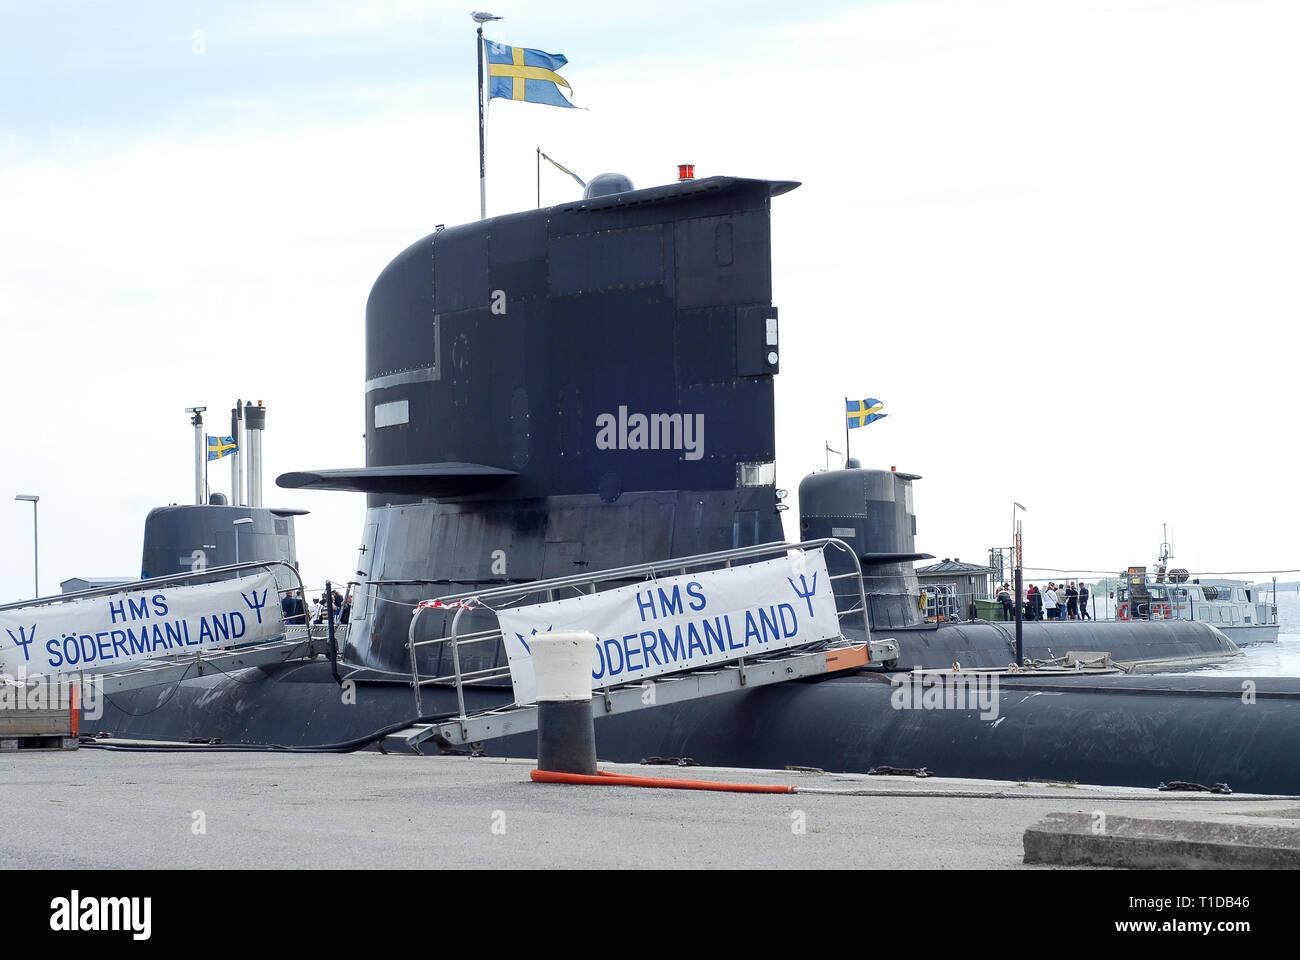 HSwMS clase Södermanland Södermanland, submarino, HSwMS Östergötland, clase Södermanland submarino y Halland HSwMS Hnd, Gotland submarino de clase 1 Foto de stock